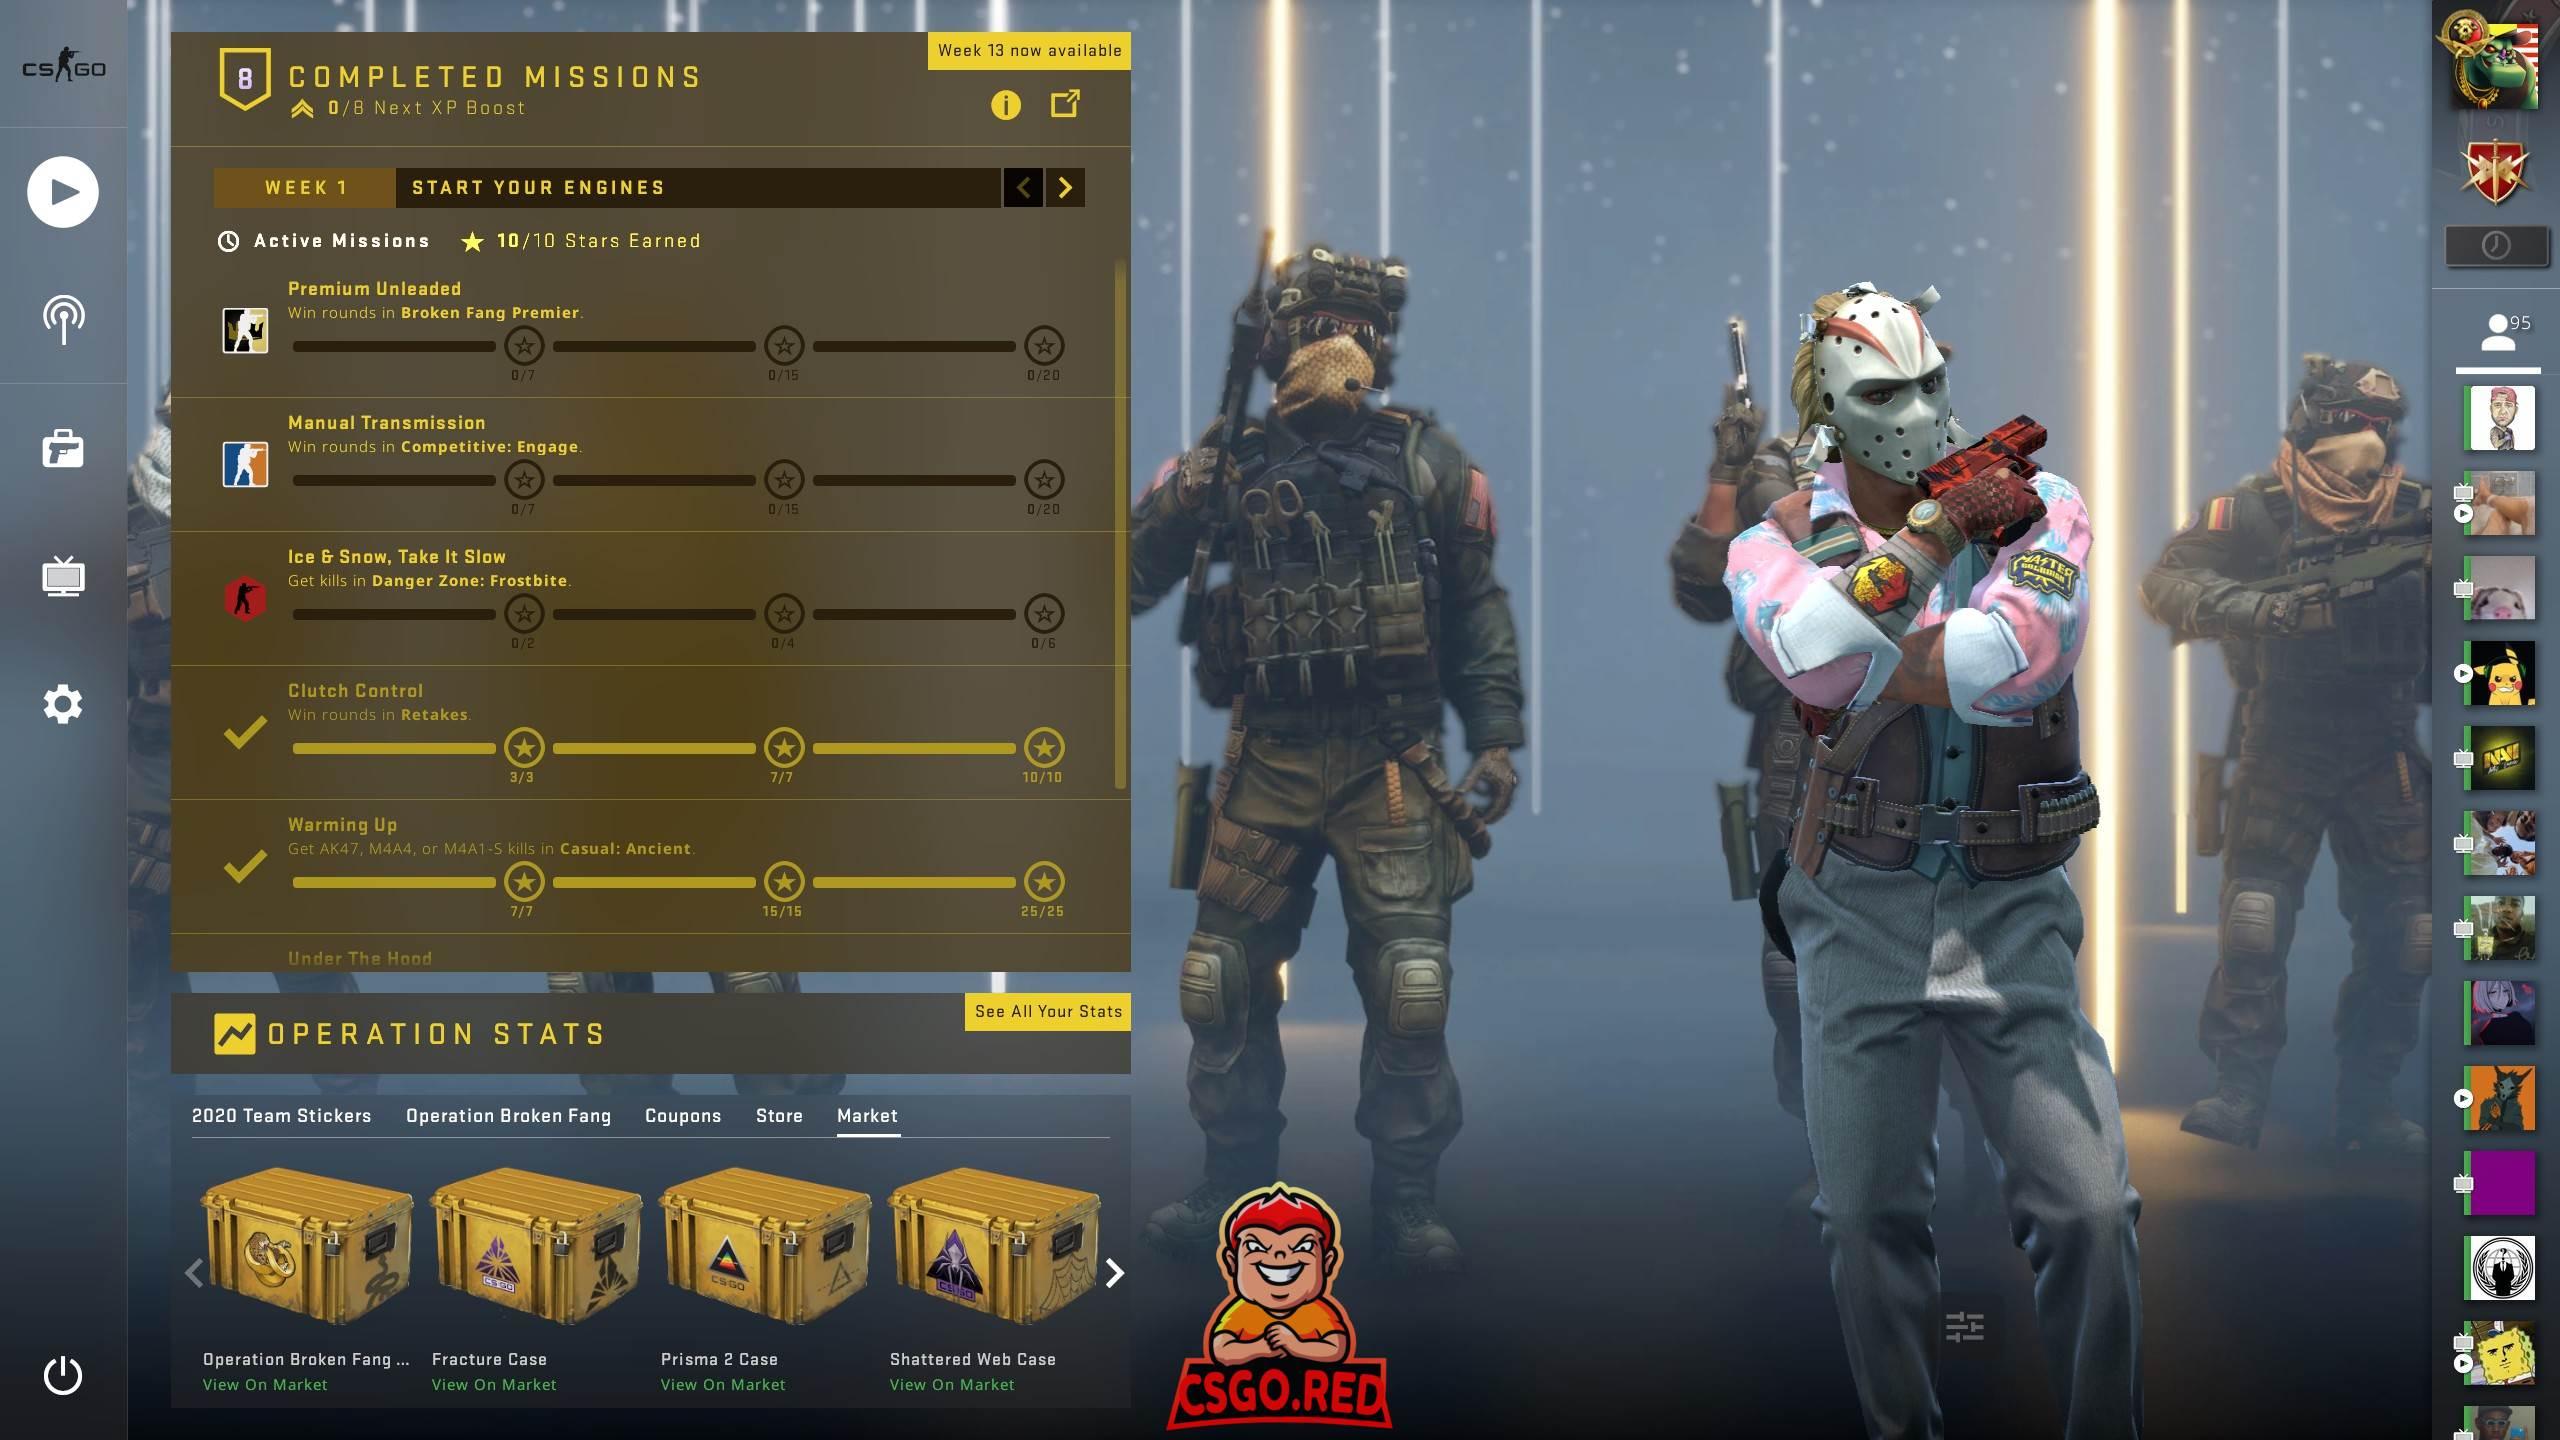 CSGO Counter-terrorist Background Panorama UI Preview